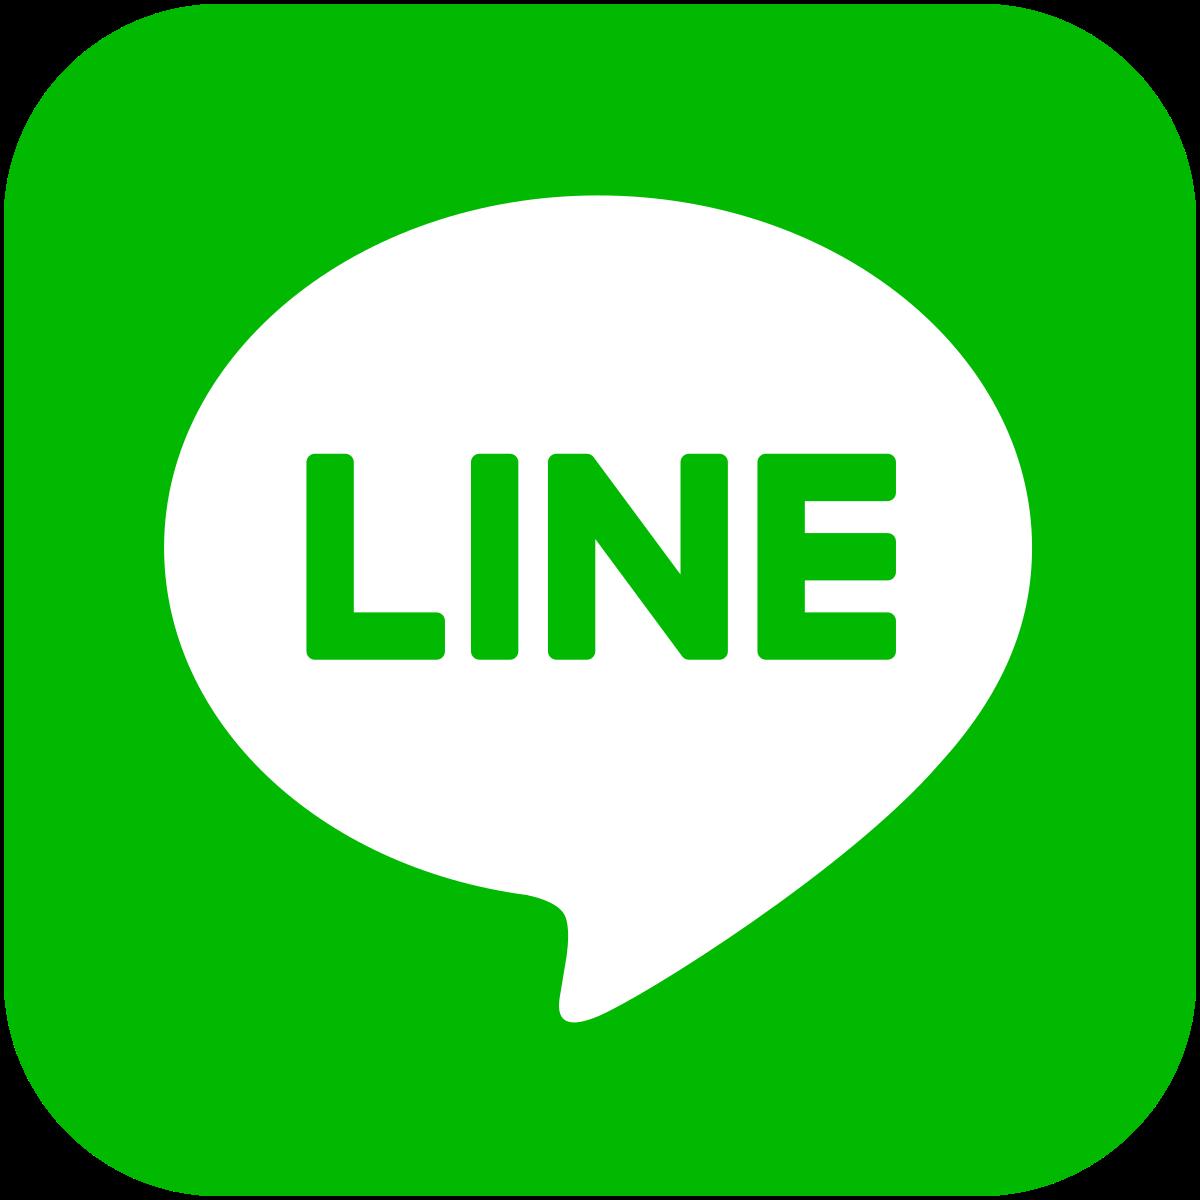 Line (software).